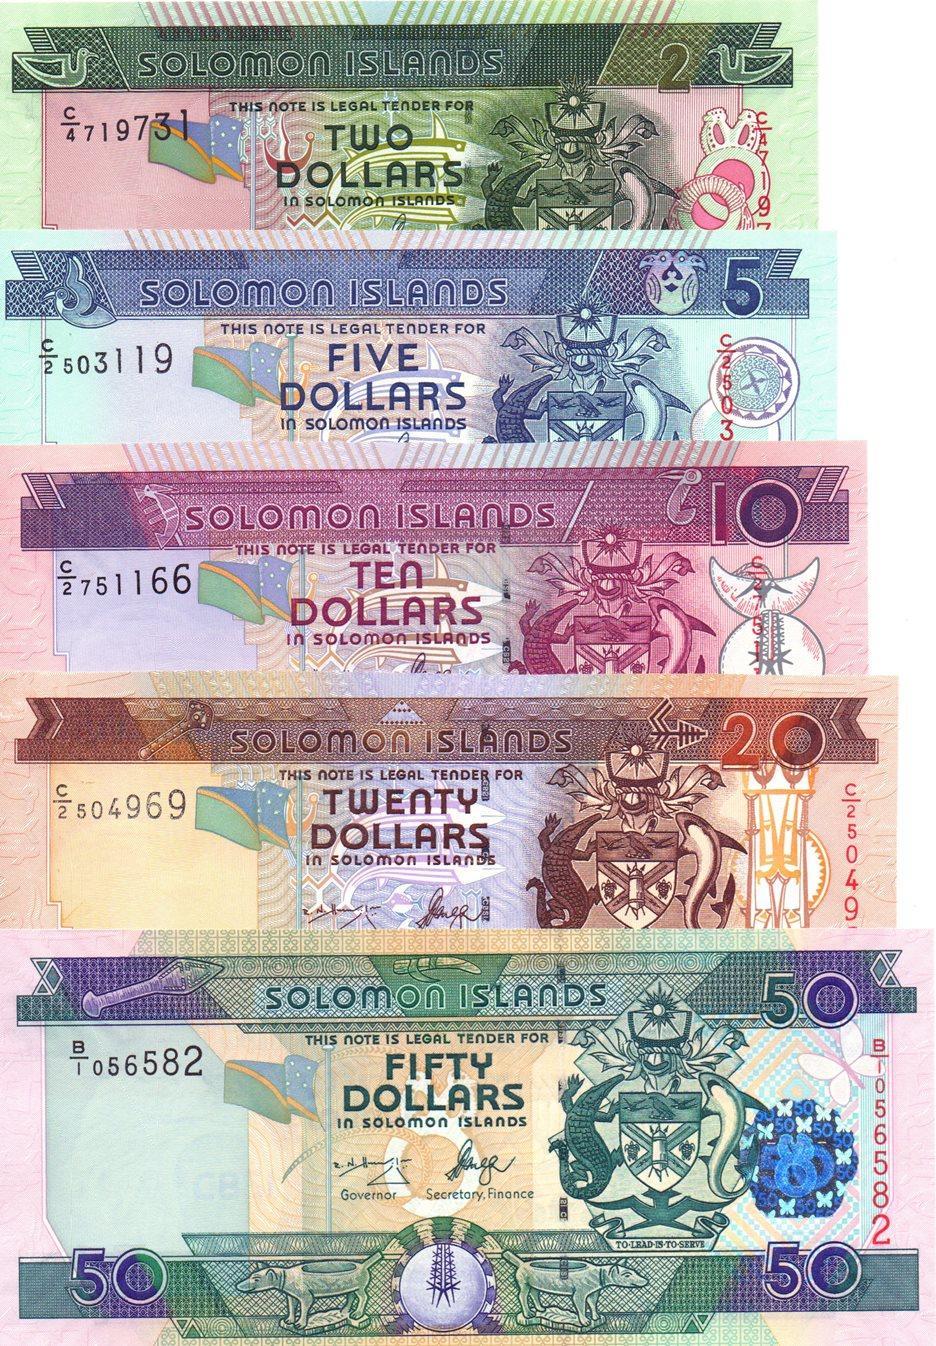 Solomon Islands 100 Dollars 2009 UNC P-30b